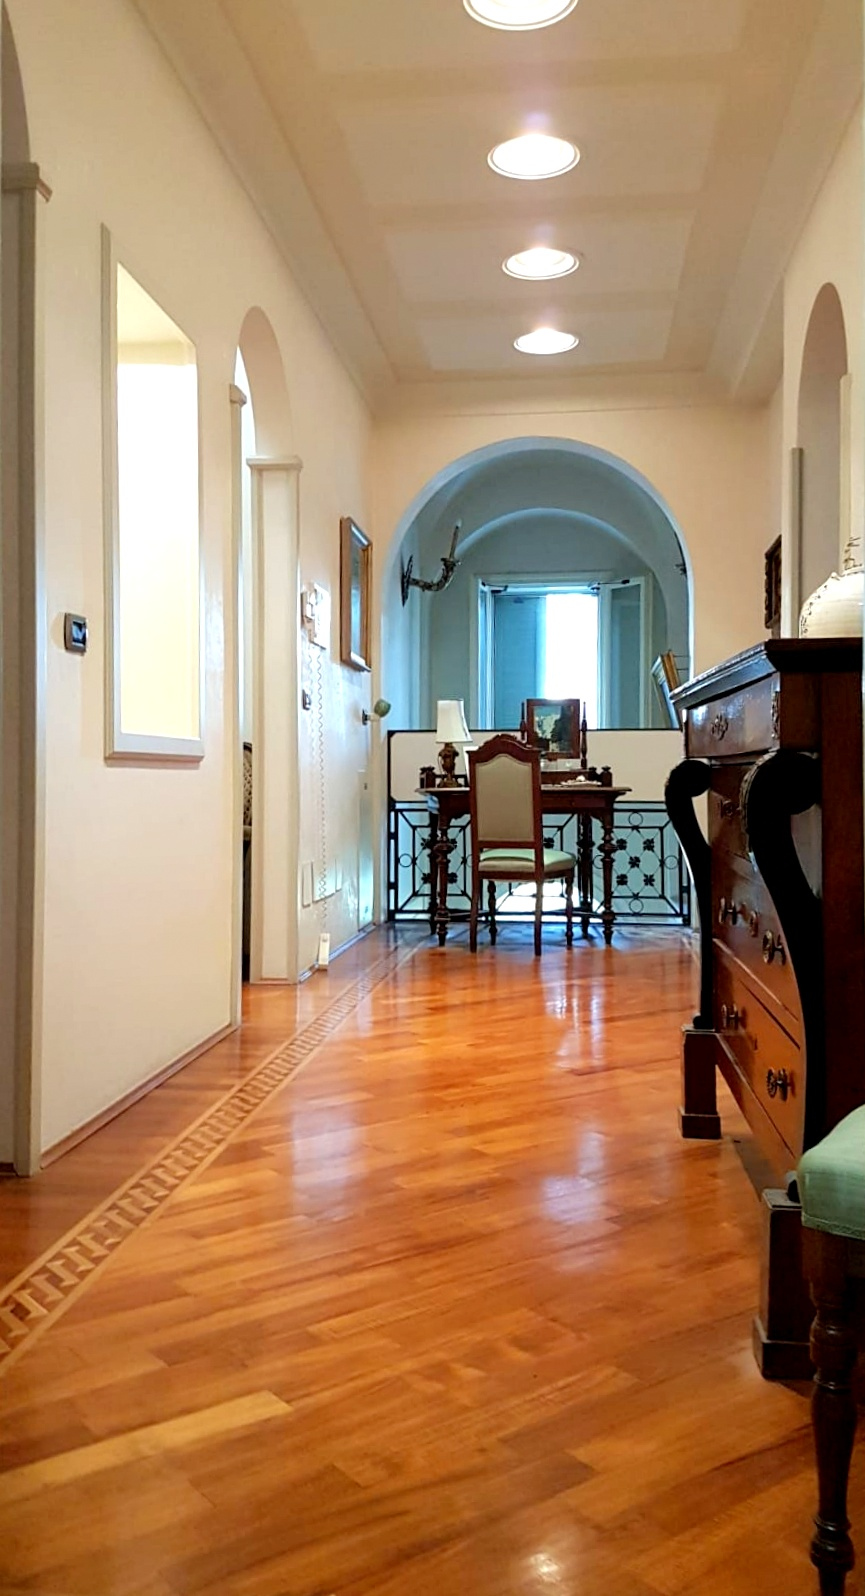 Vendita Casa Indipendente Casa/Villa Mantova 177975